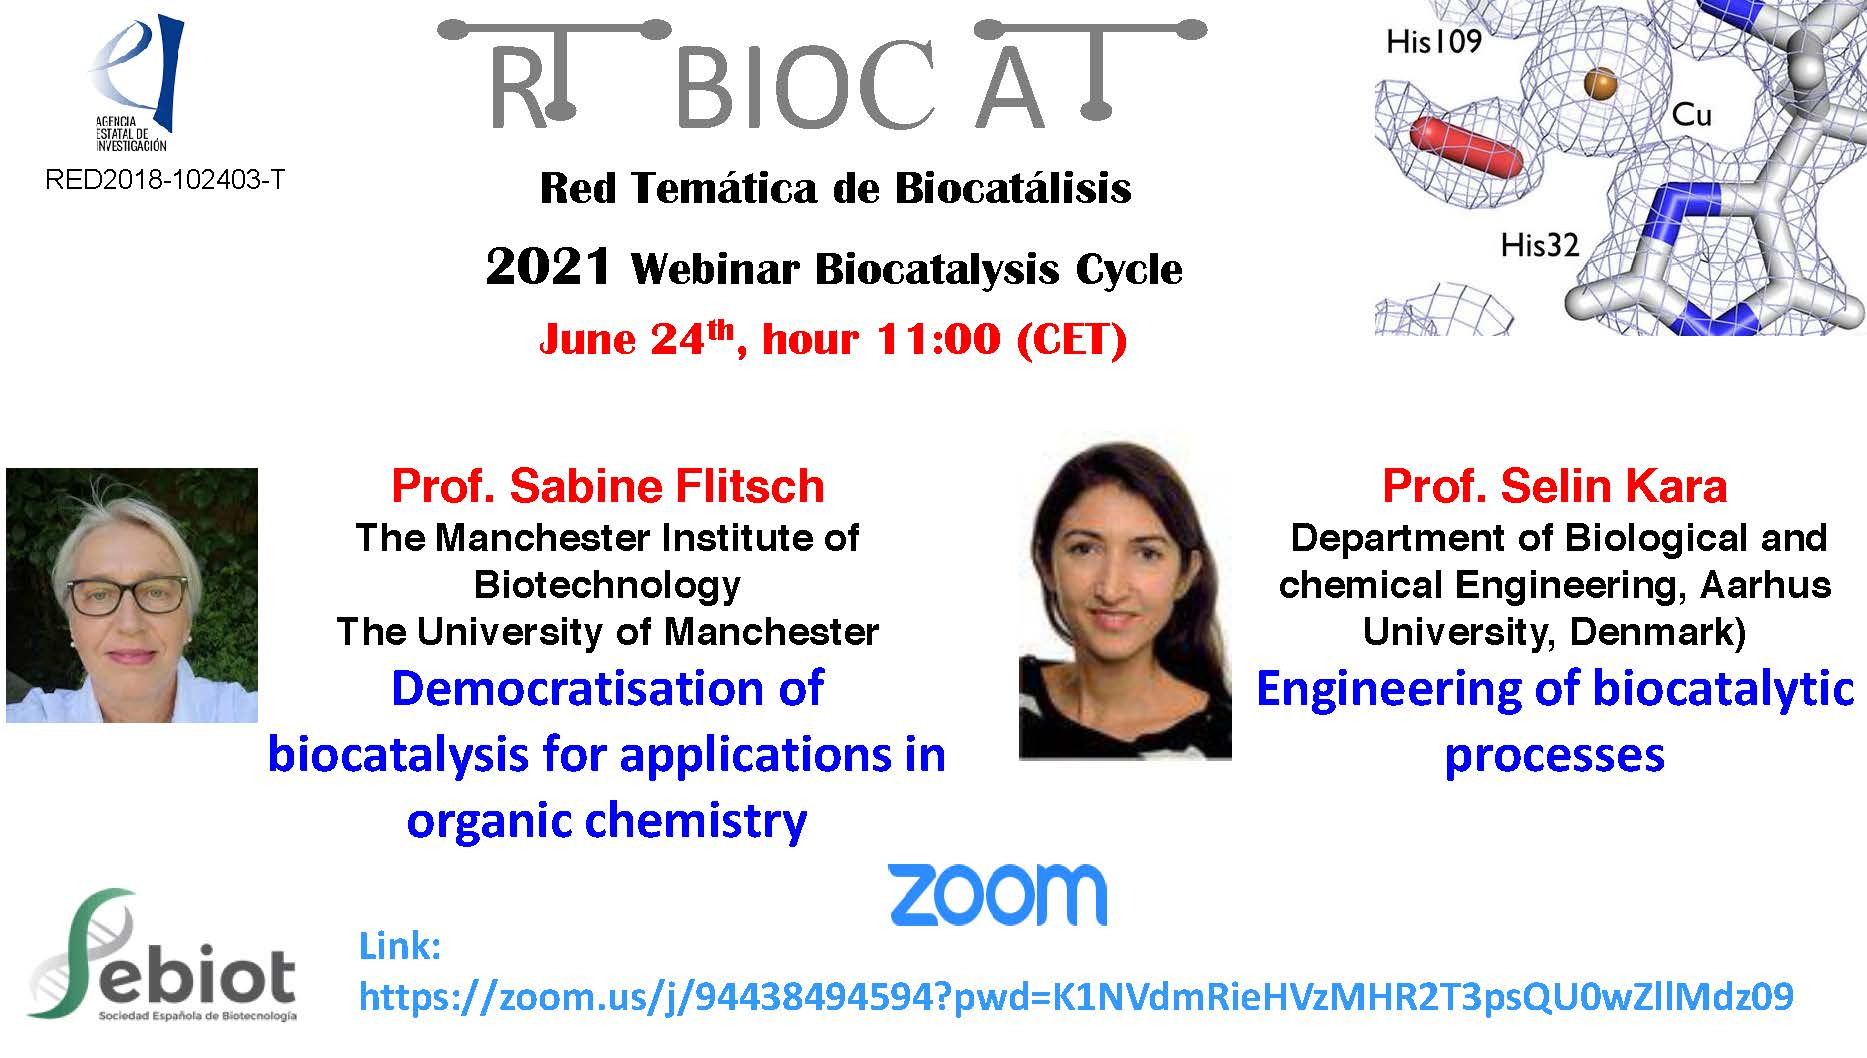 Seminarios Biocatalisis 24 junio 2021